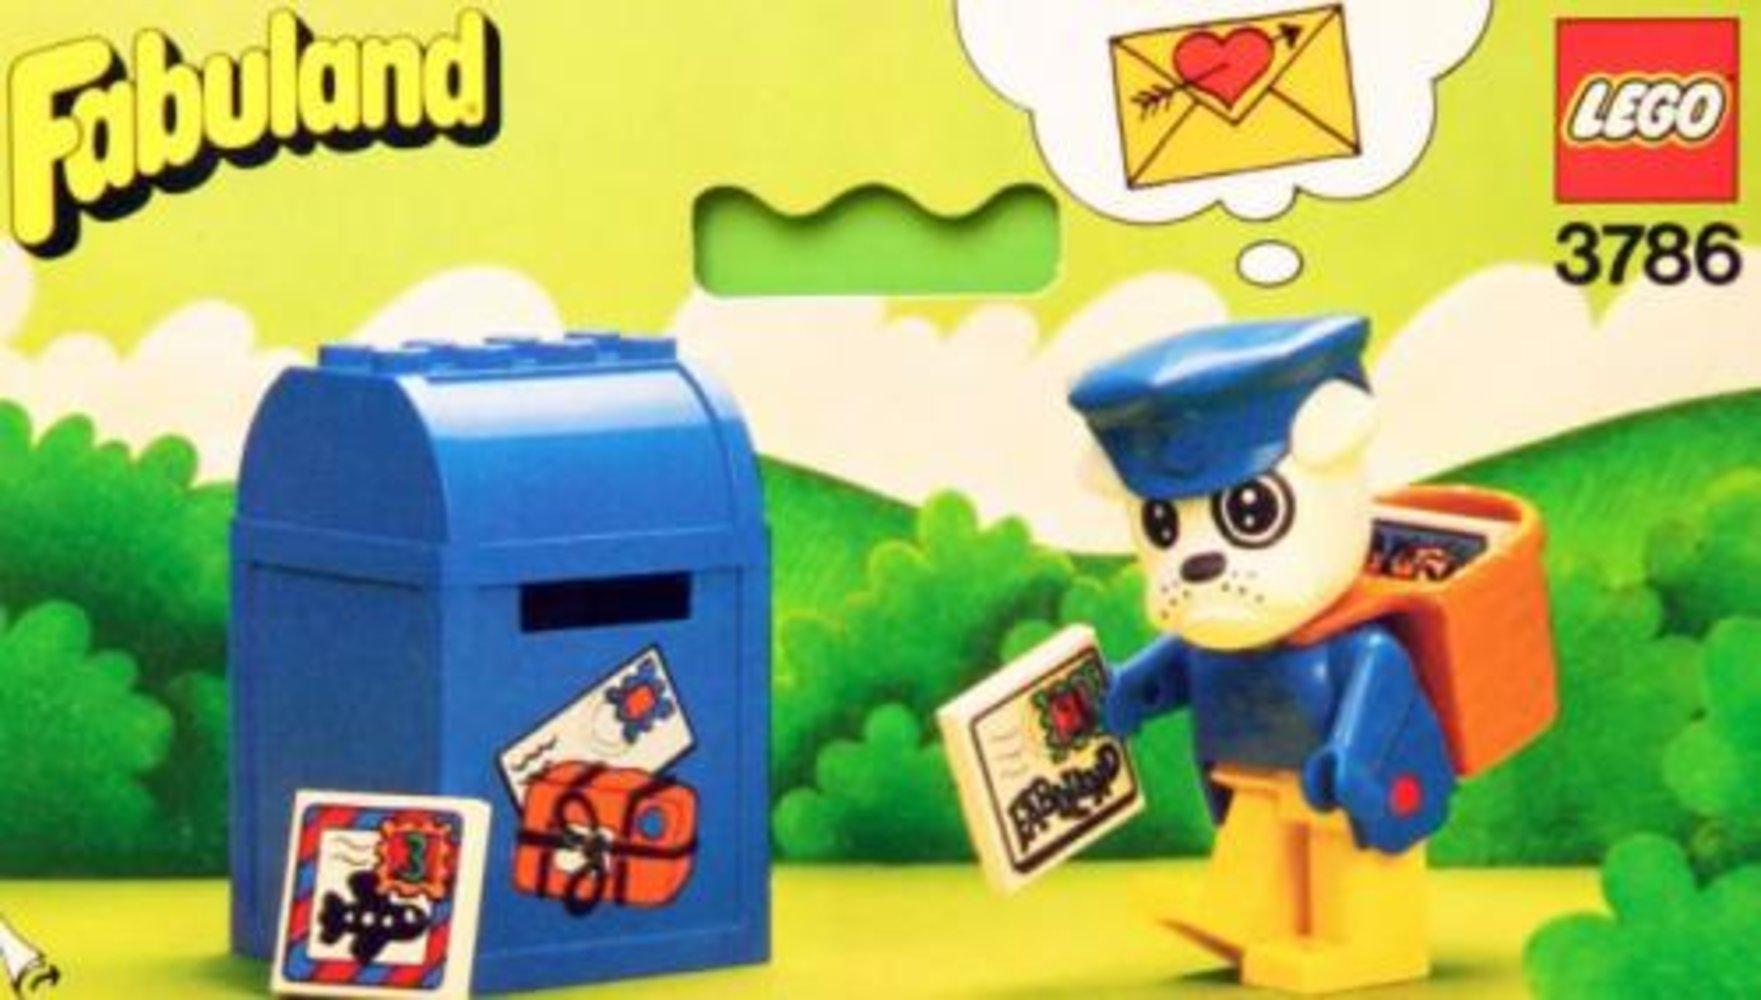 Buzzy Bulldog the Postman